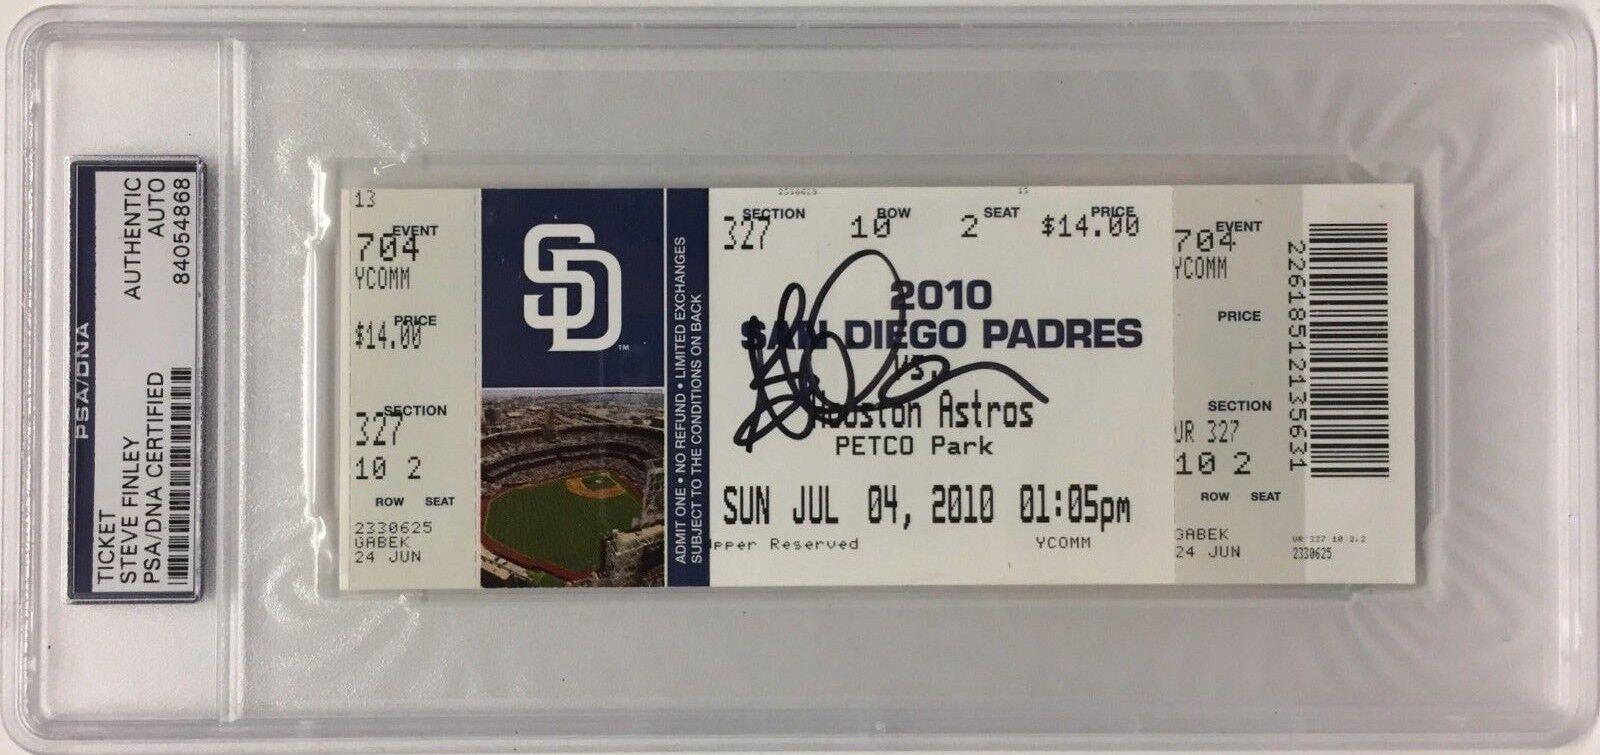 Steve Finley Signed Baseball Ticket July 04, 2010 PSA 84054868